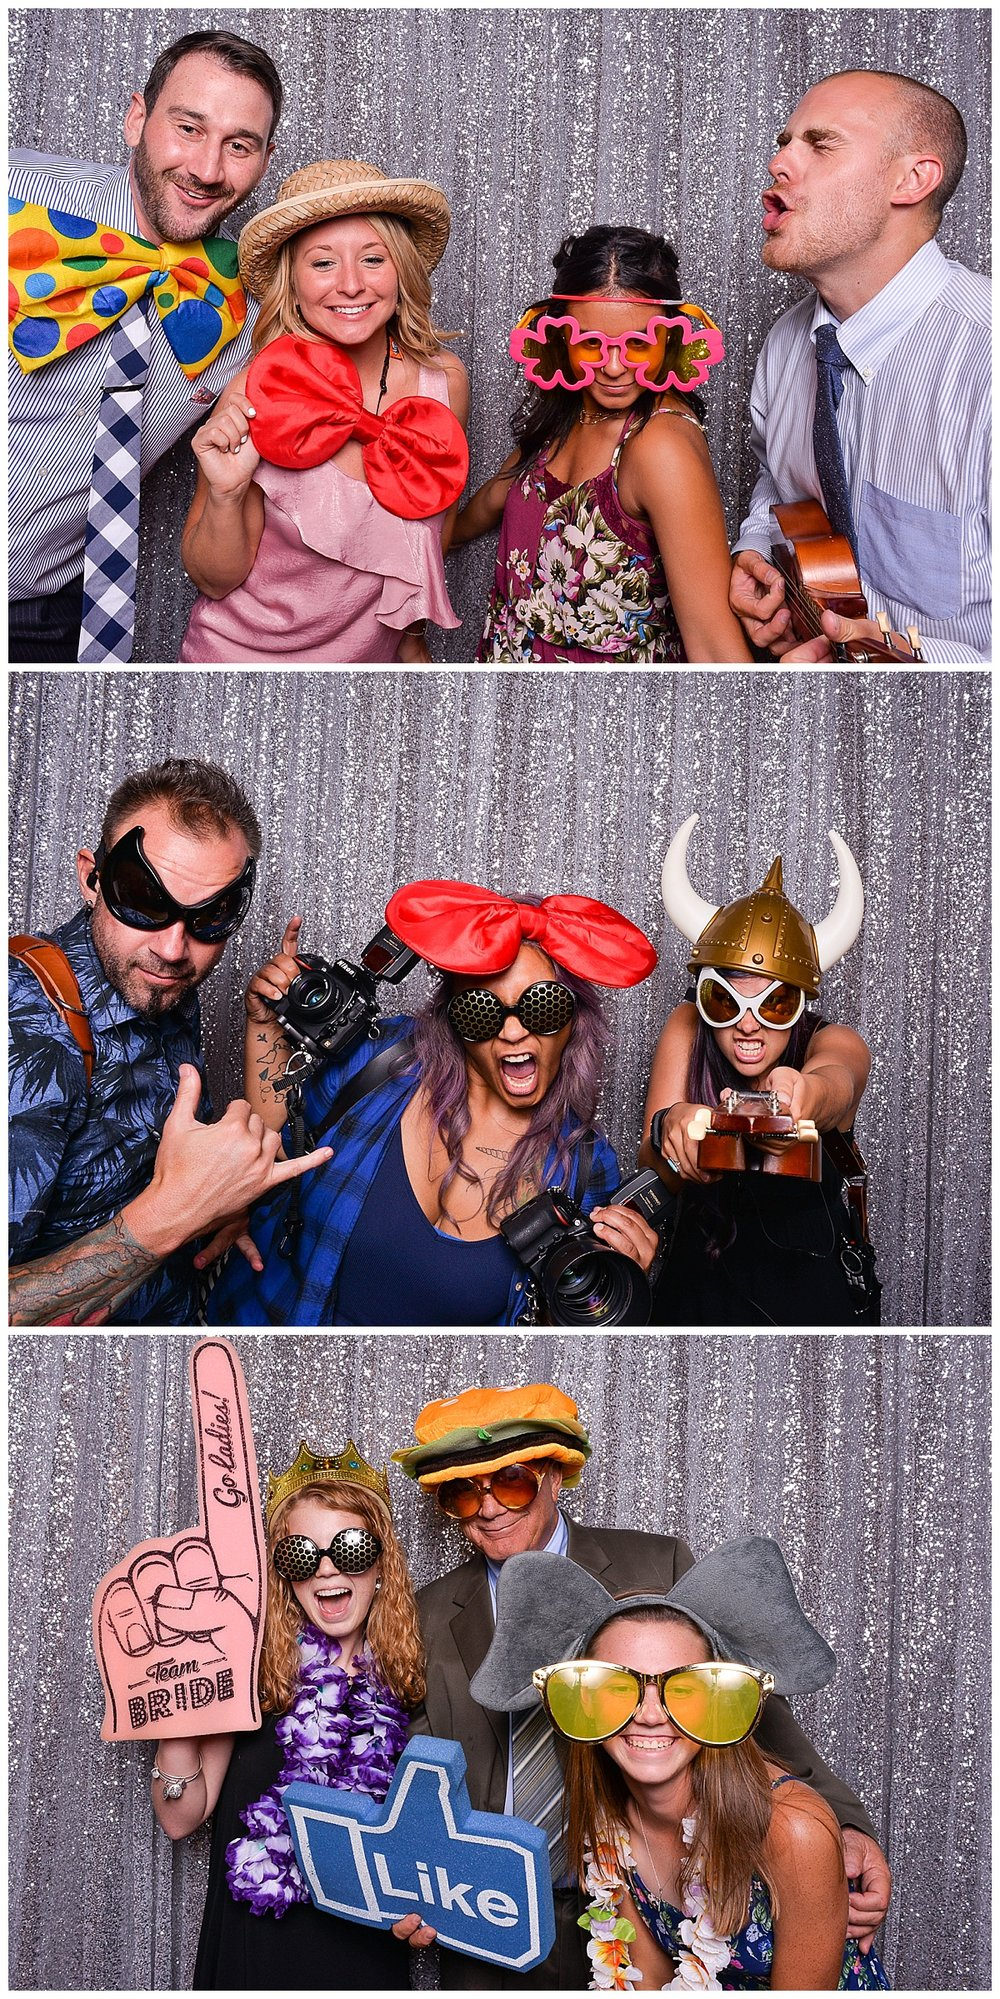 Amy + Ryan | Wedding Day | Aloha Booth | Wedding Day | Aloha Booth | Wedding Day | Aloha Booth